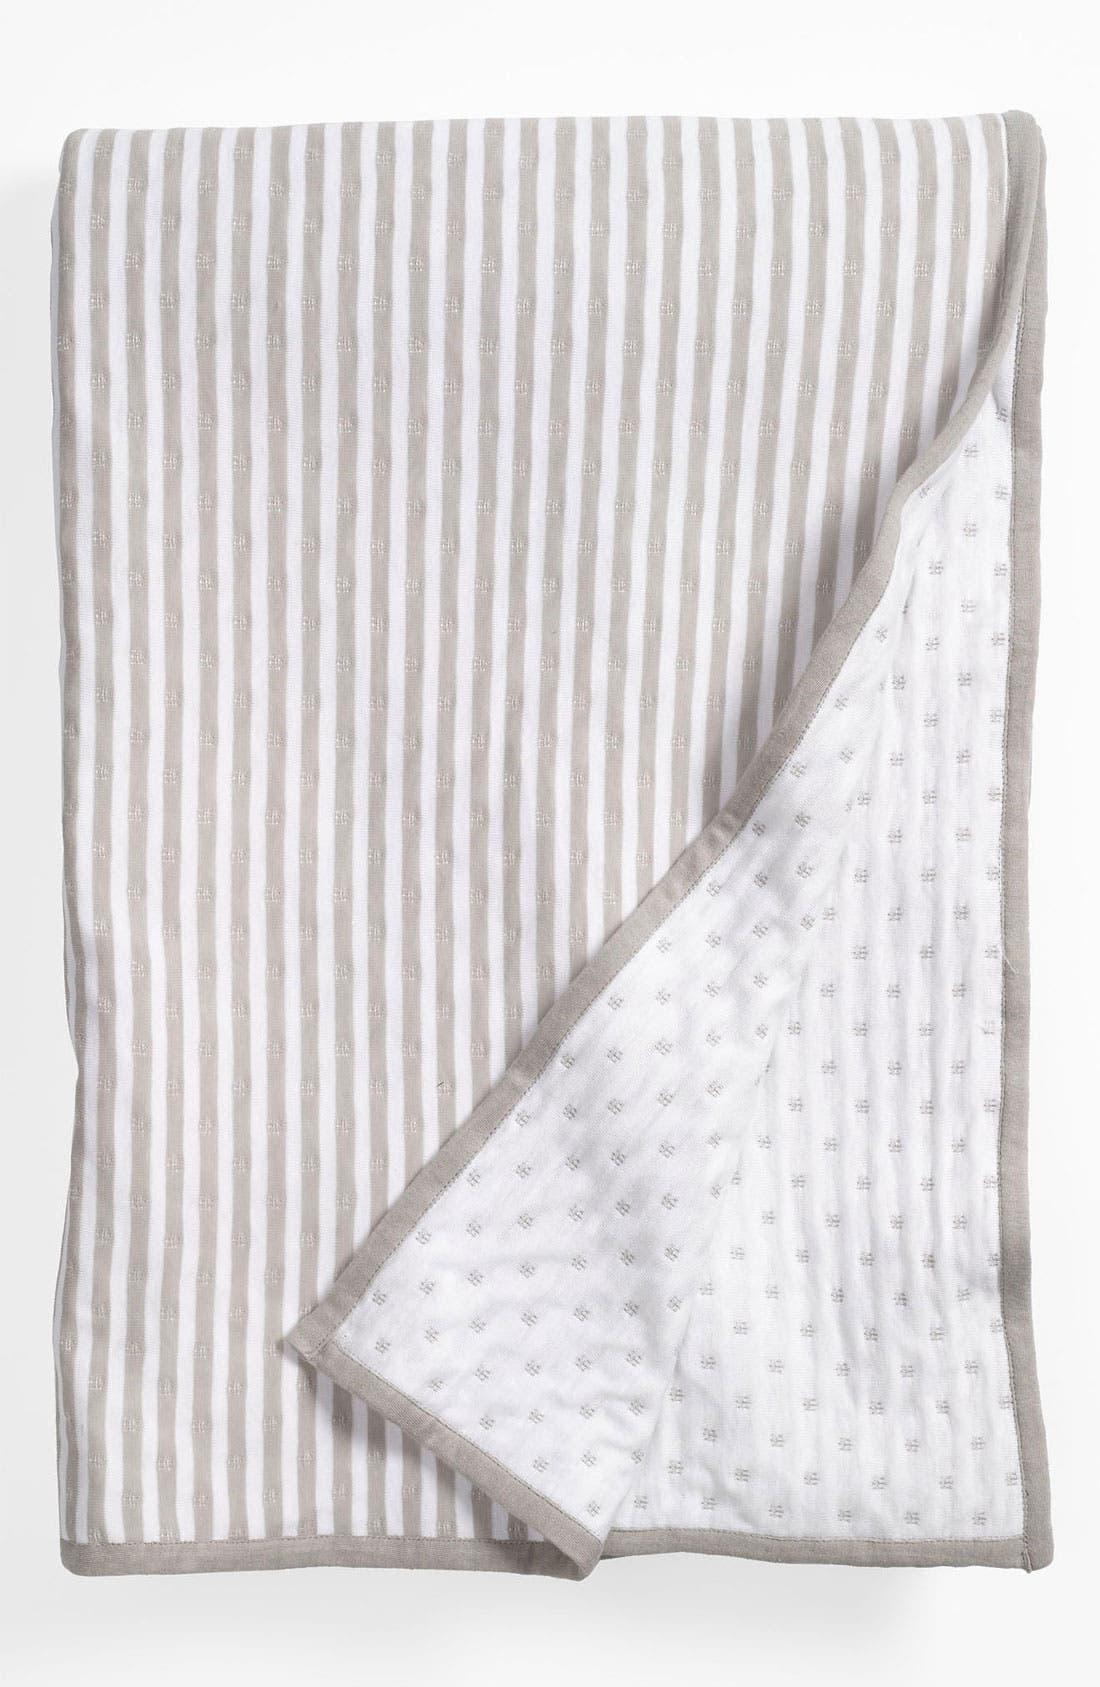 Main Image - Nordstrom at Home 'Stargazer' Reversible Blanket